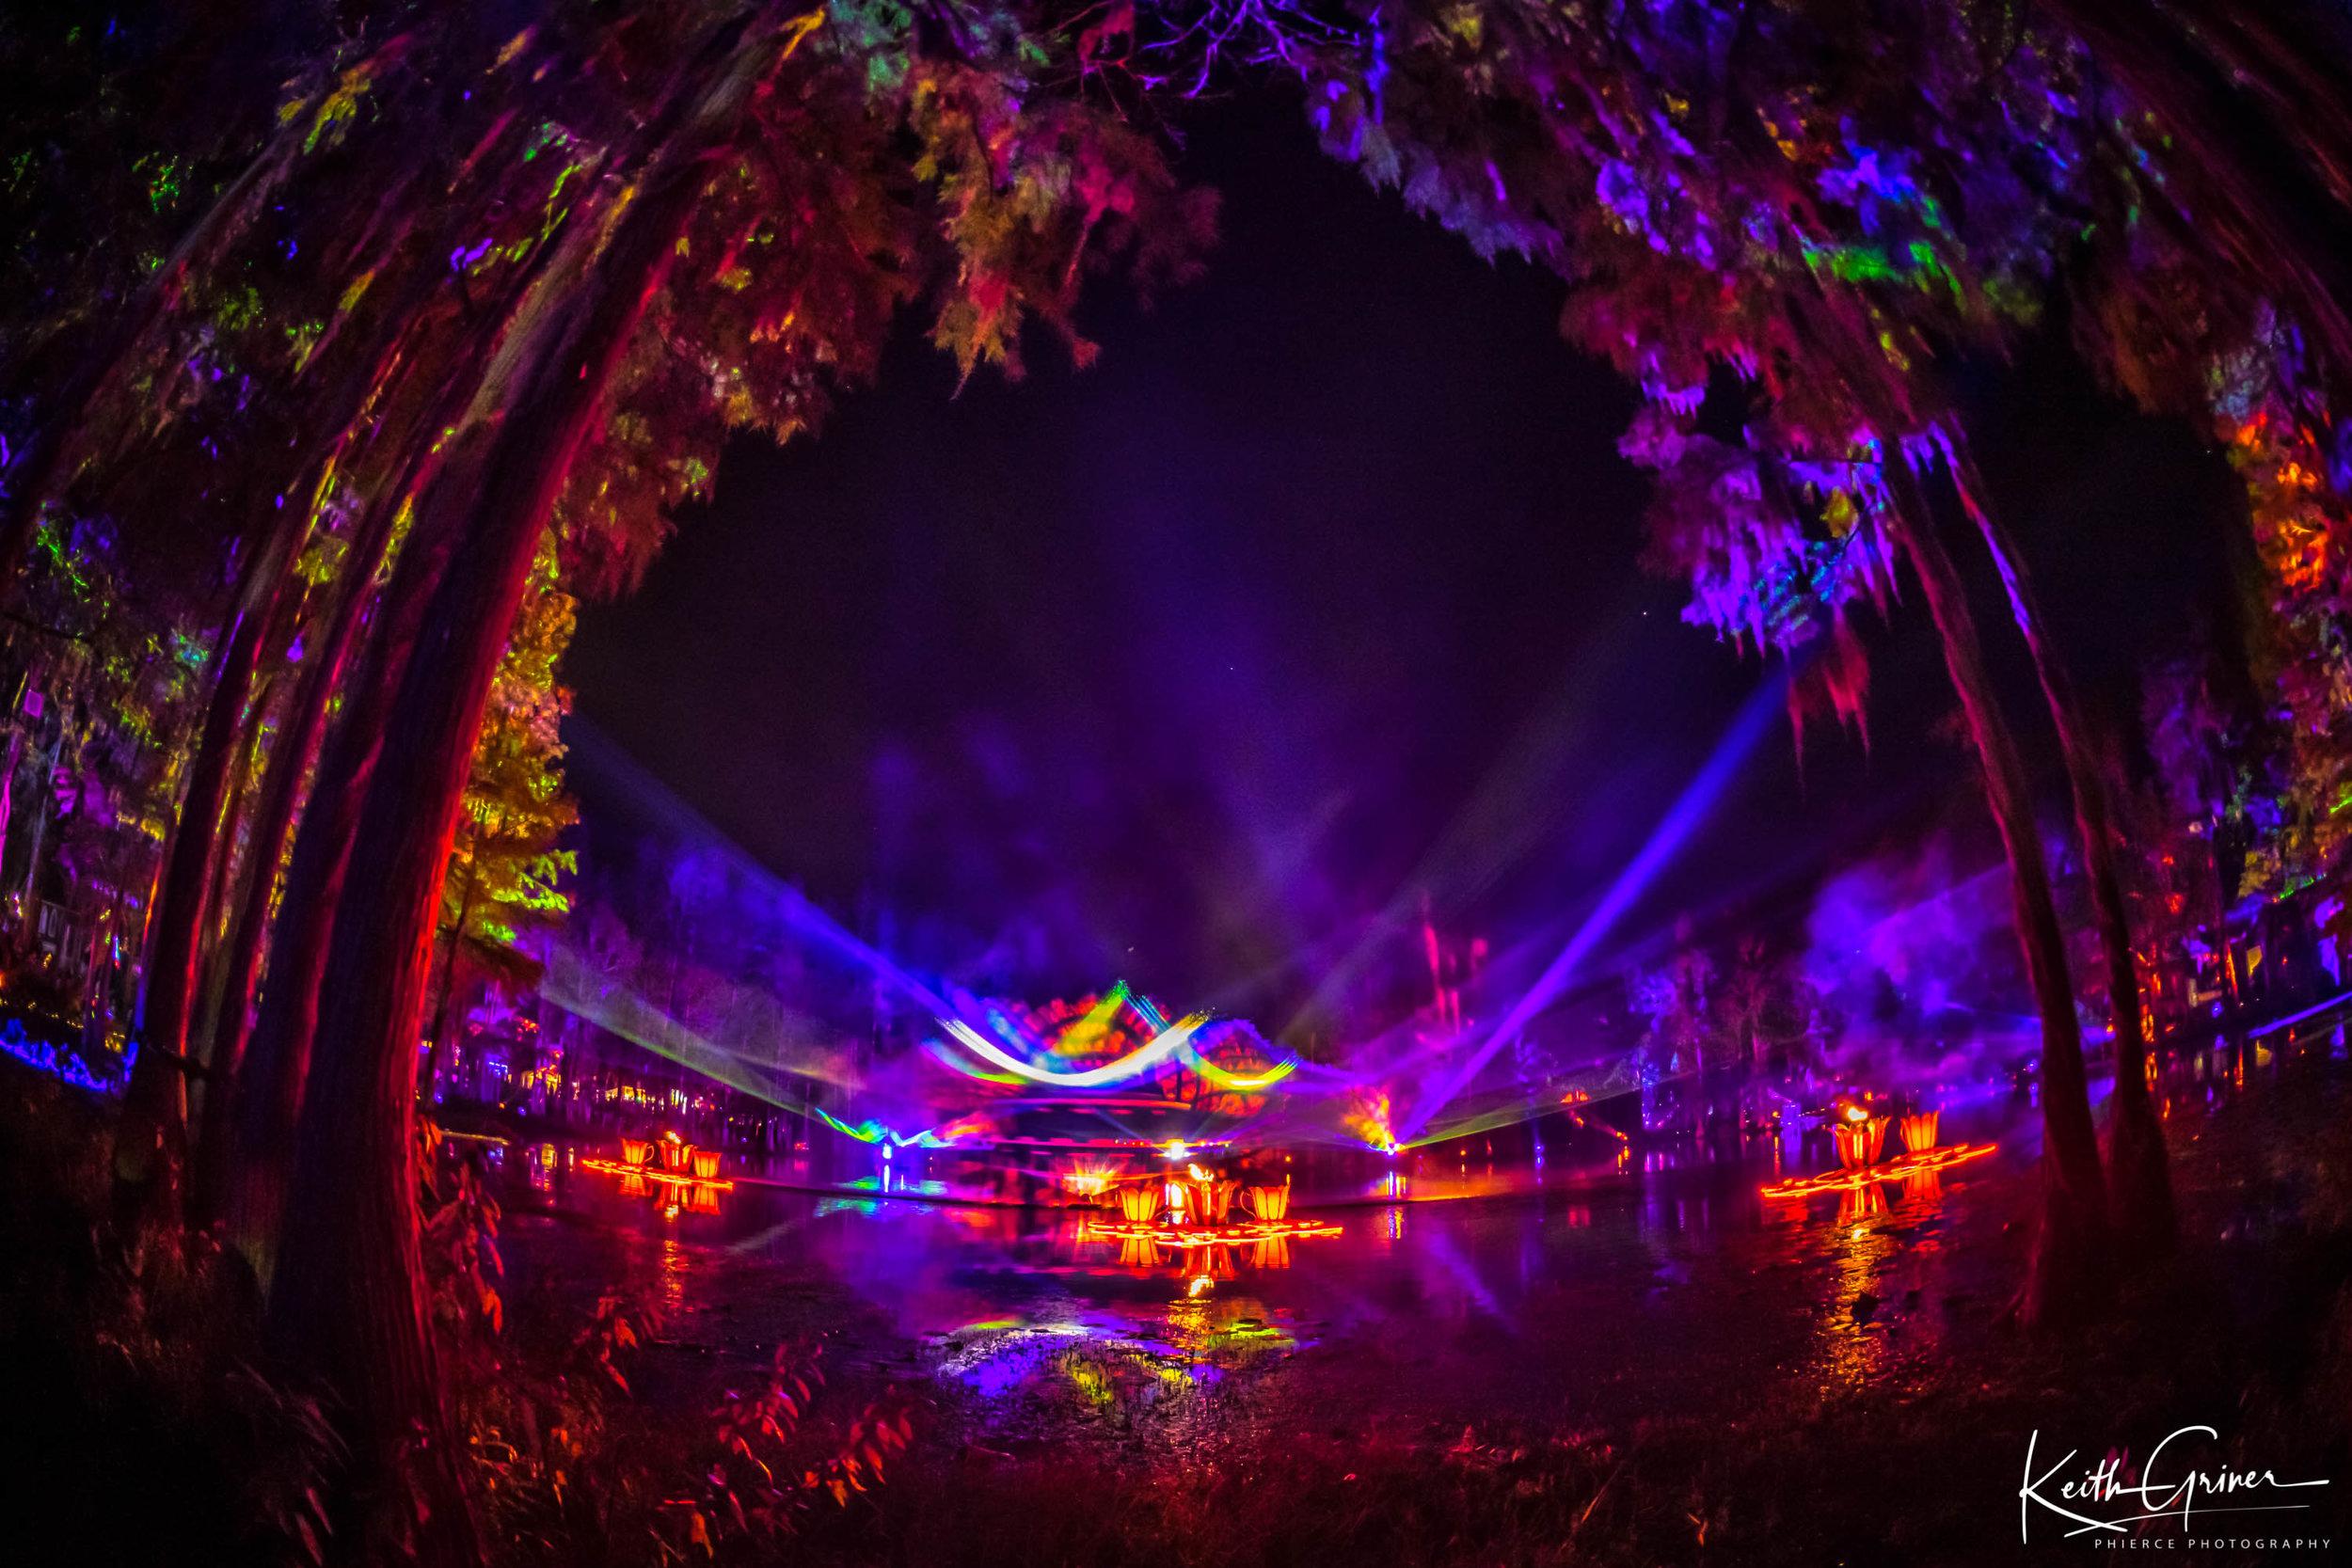 Hula_Spirit Lake_by Keith Griner 0D5_3124-Edit.jpg